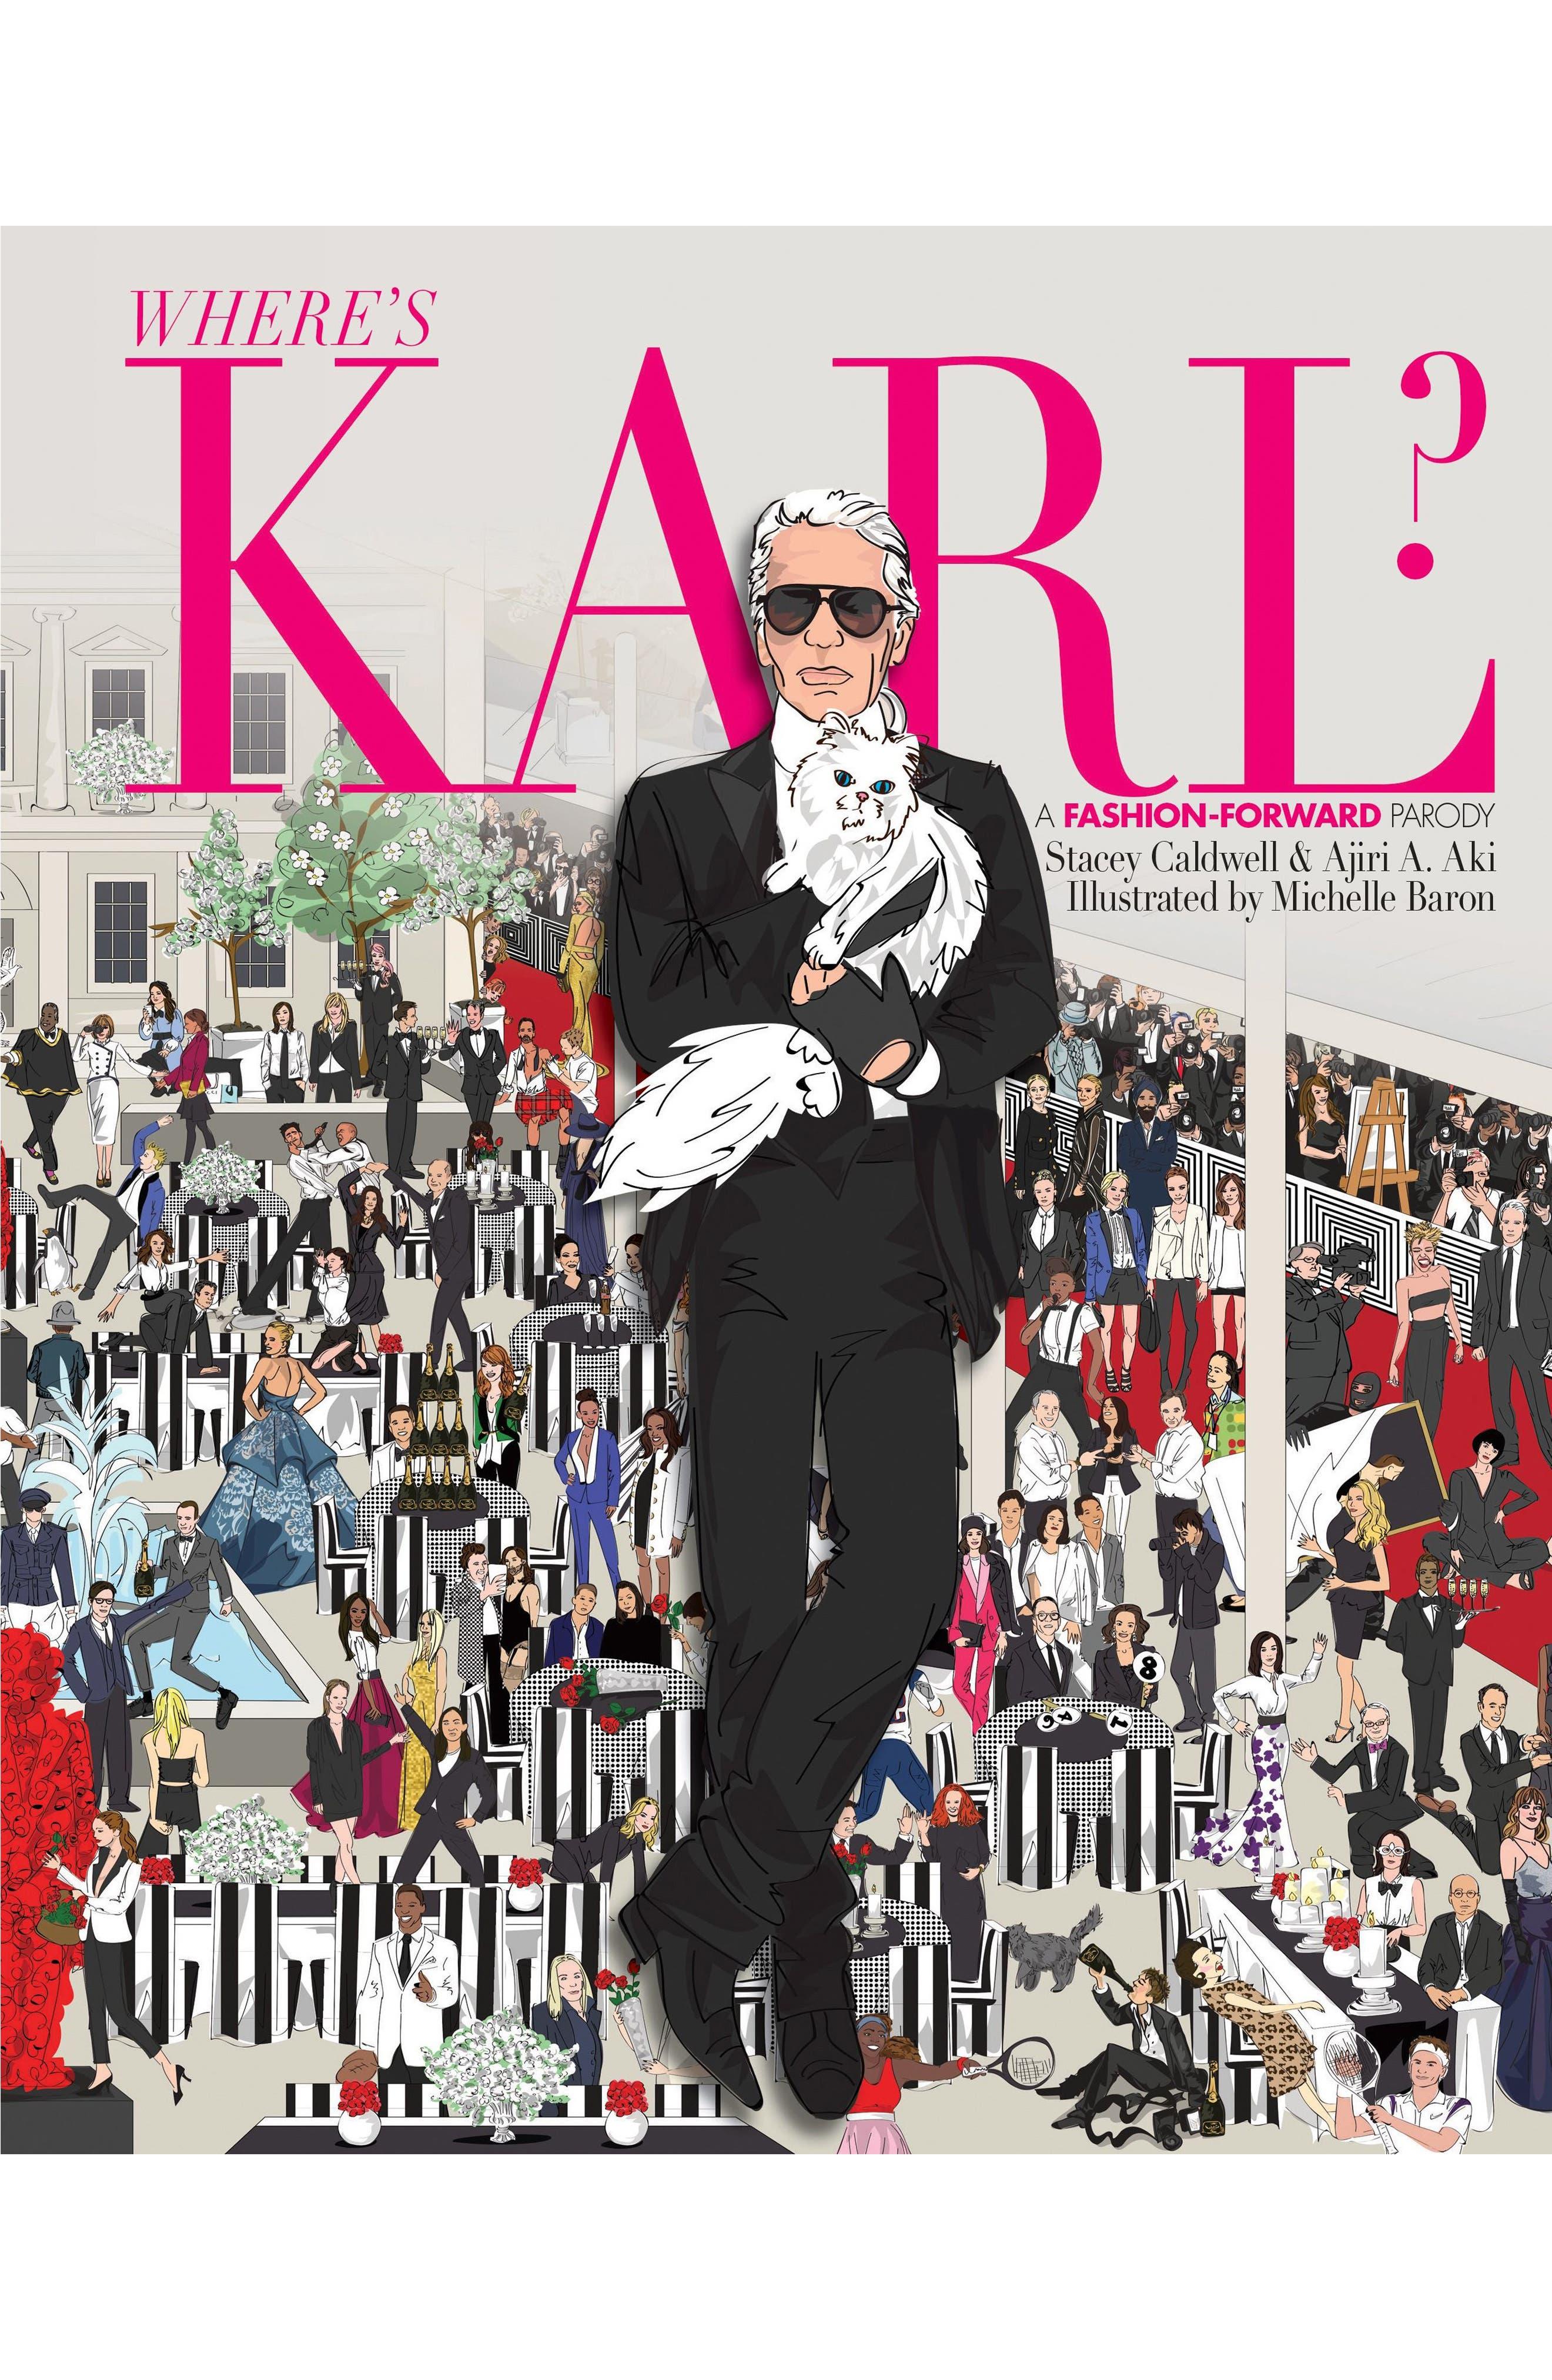 Alternate Image 1 Selected - Where's Karl?: A Fashion-Forward Parody Book